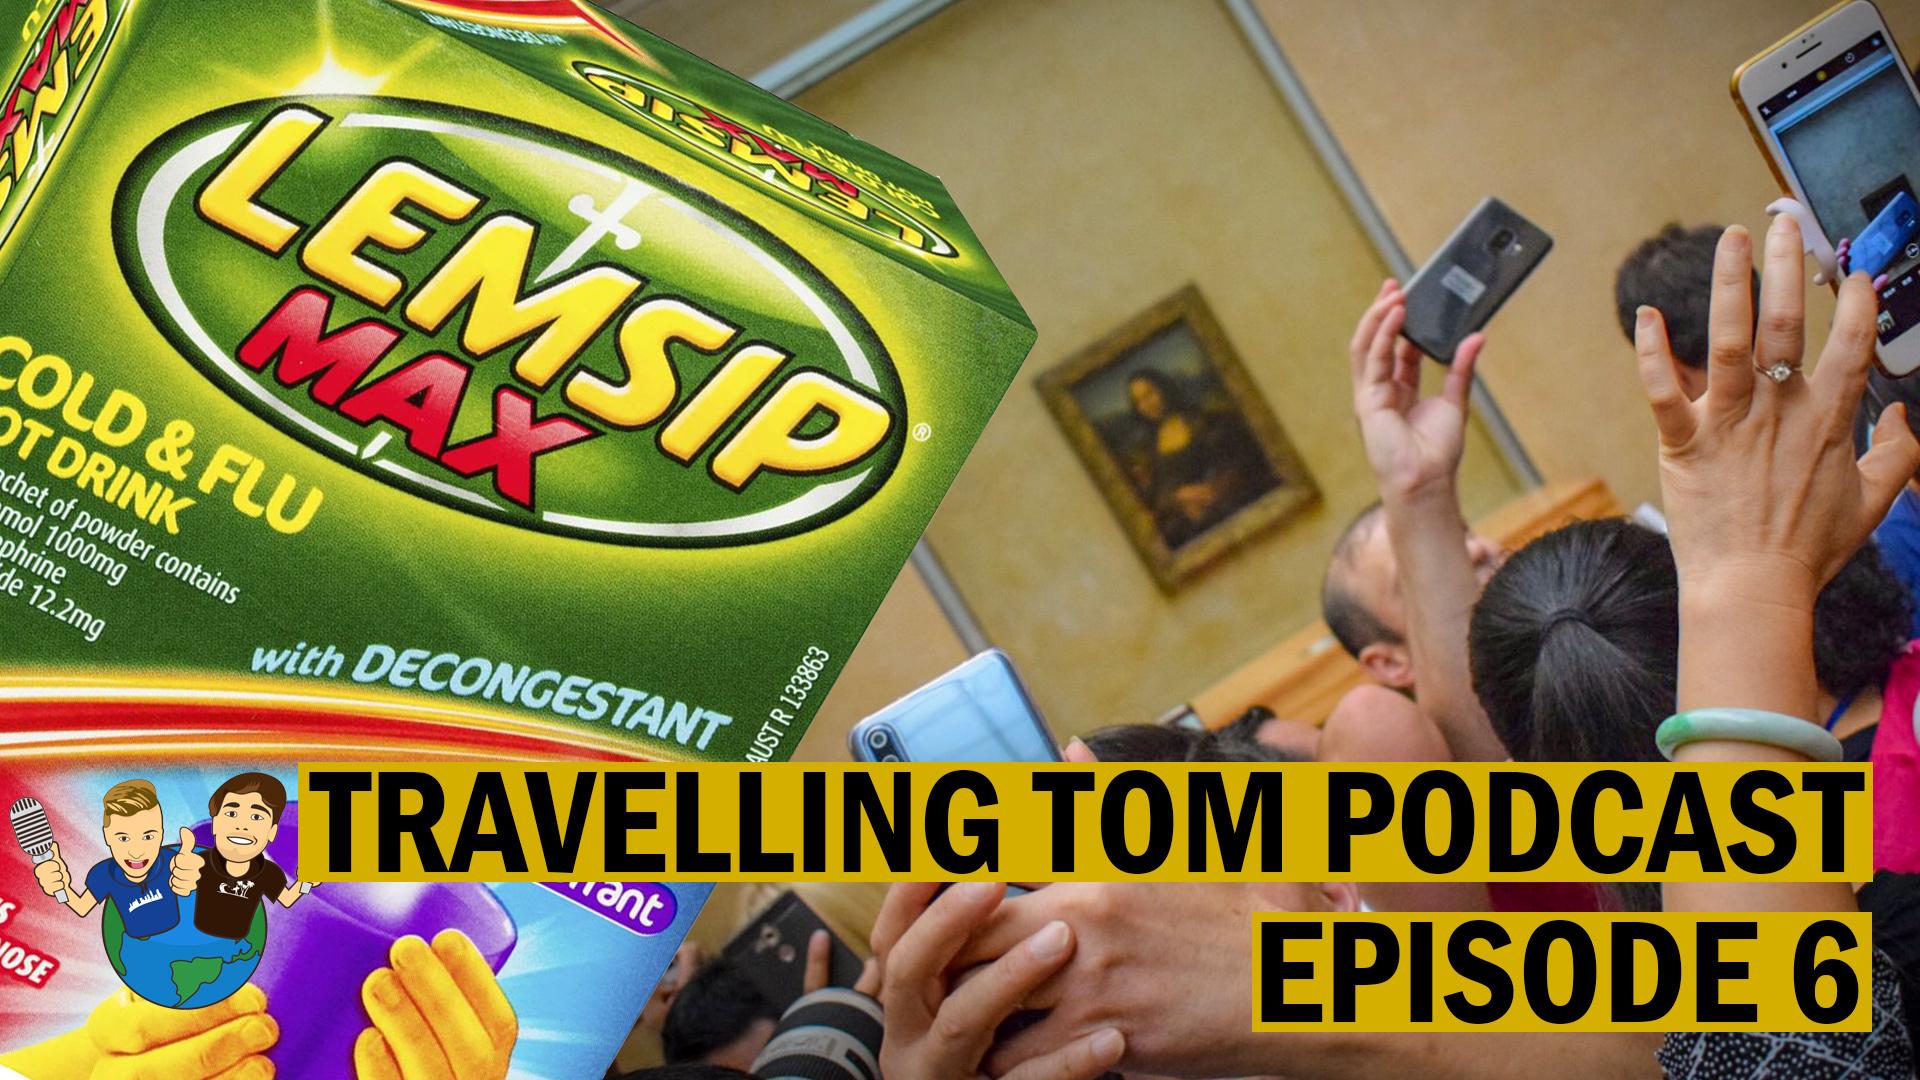 Travelling-Tom-Podcast-Mona-Lisa-Cold-Lemsip